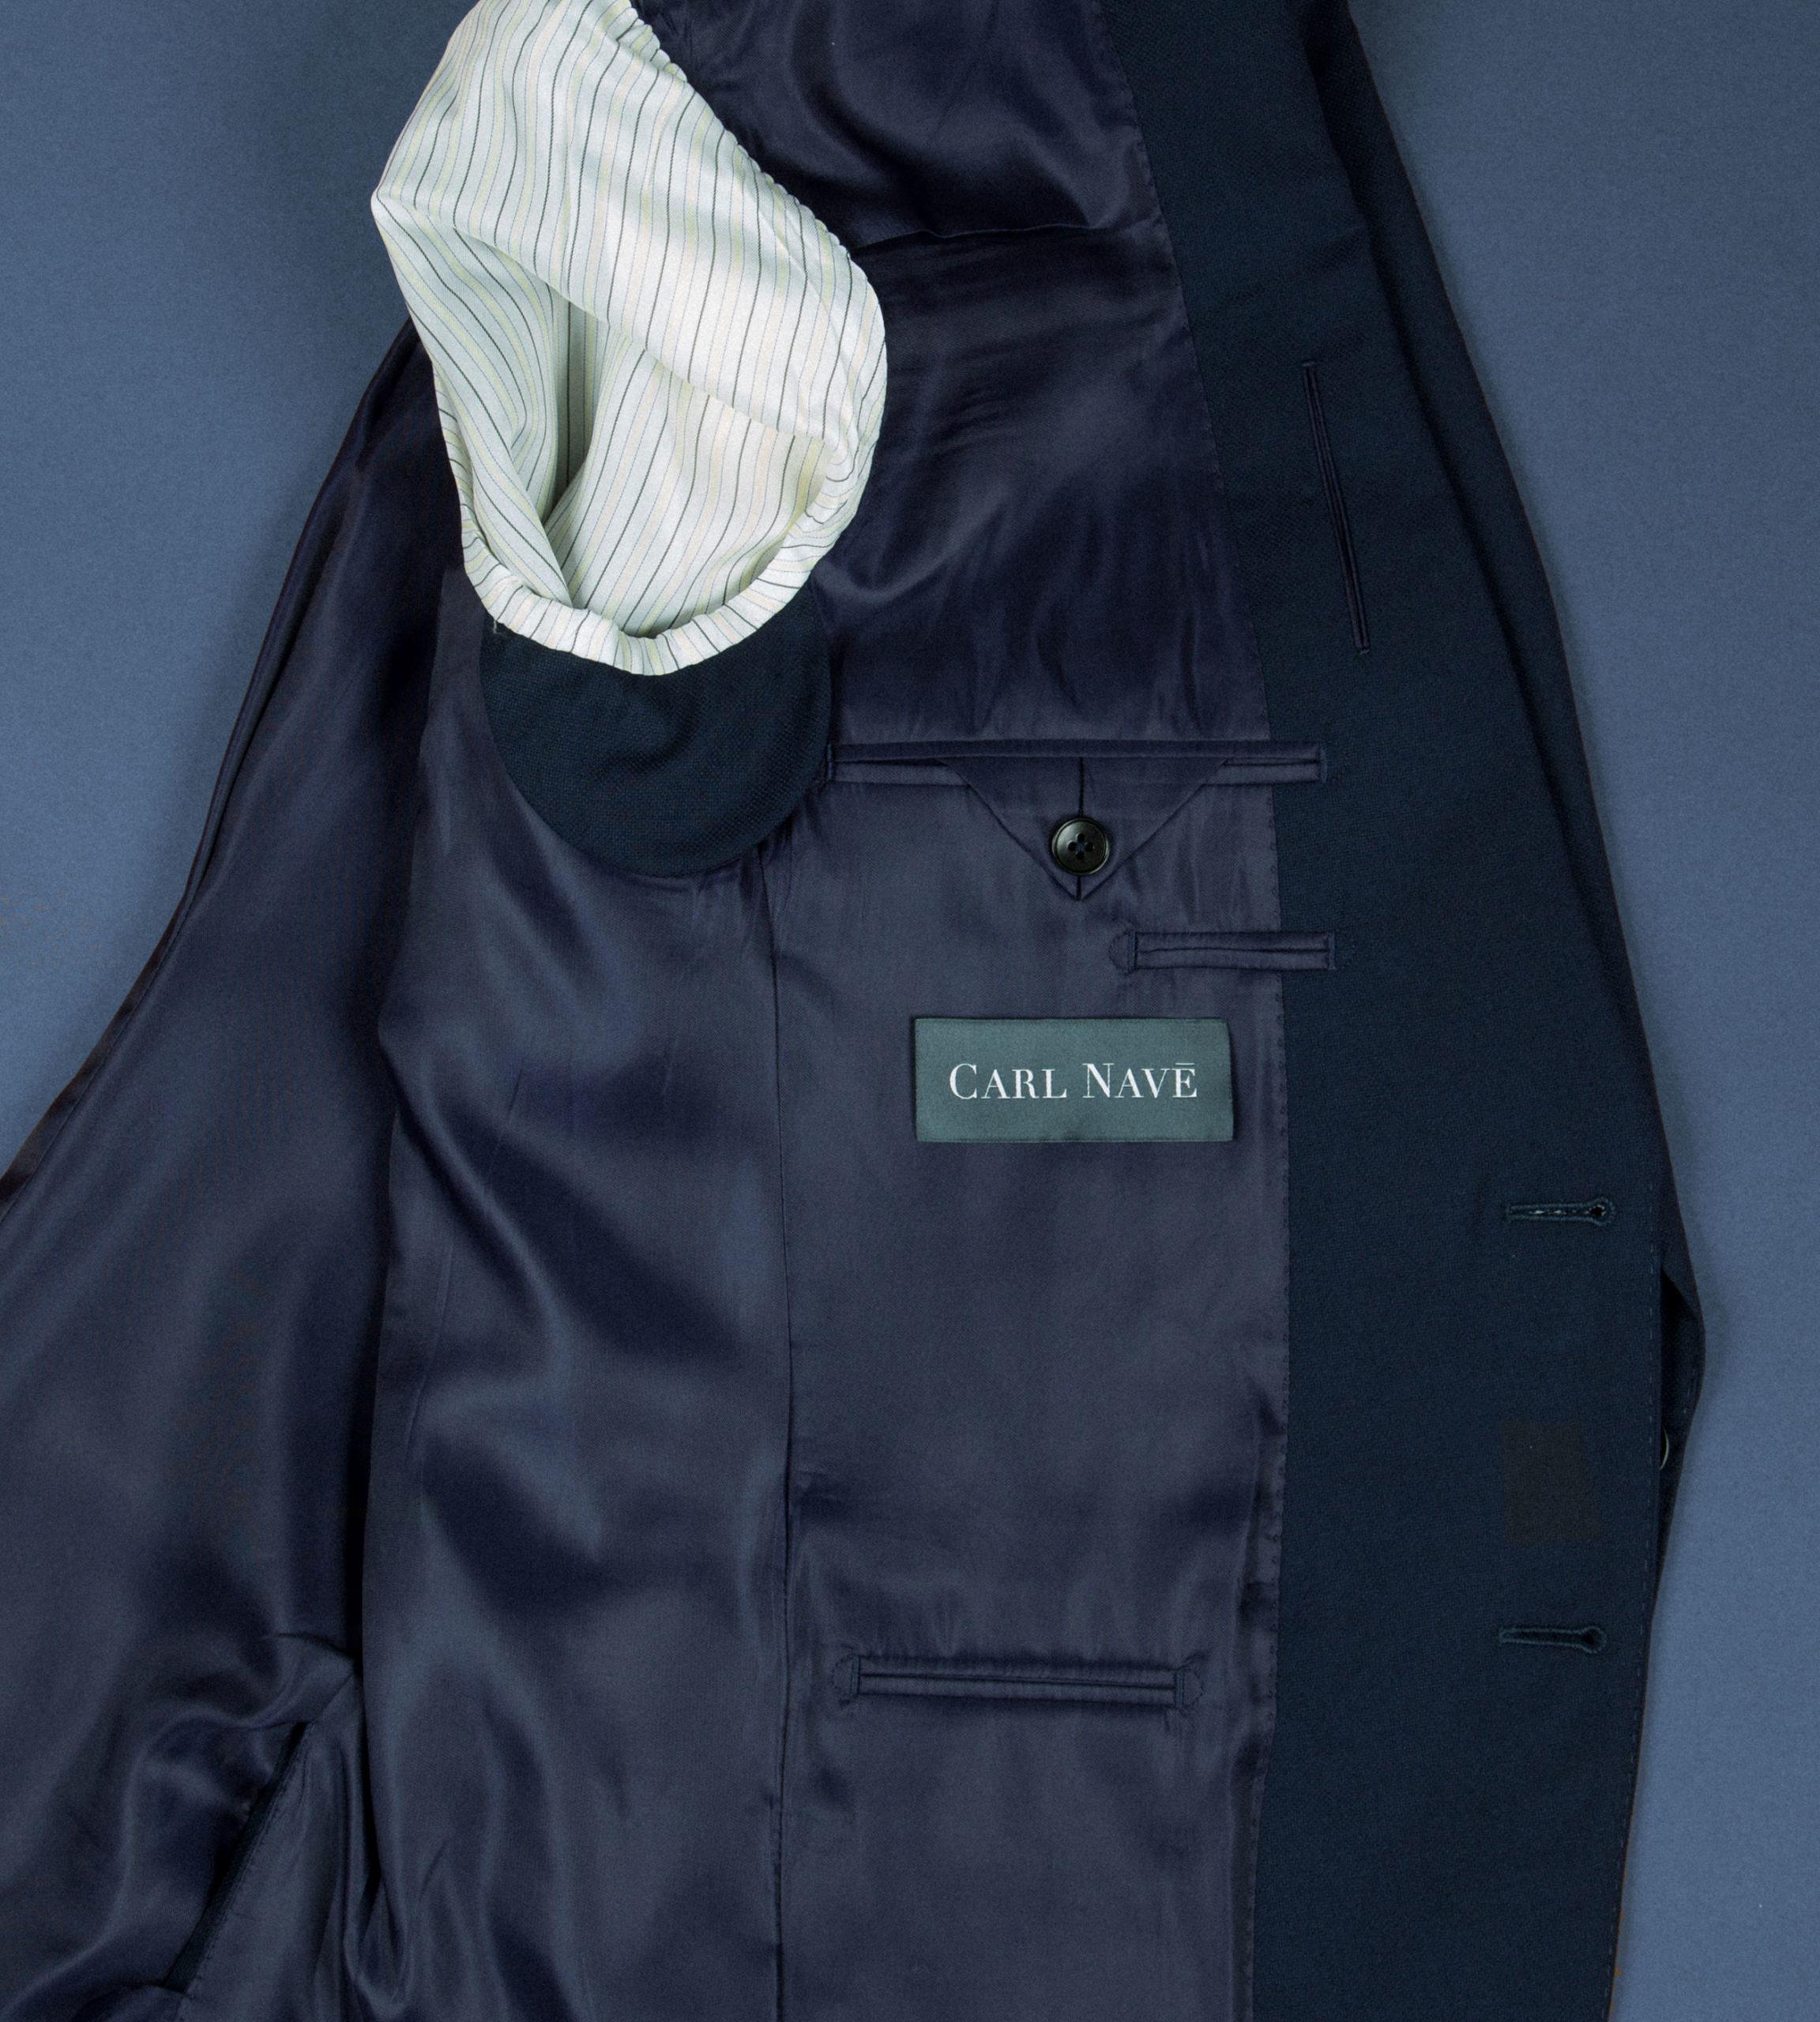 Carl-Nave-Milanese-Jacket-Navy-Melbourne-Tailor-Bespoke